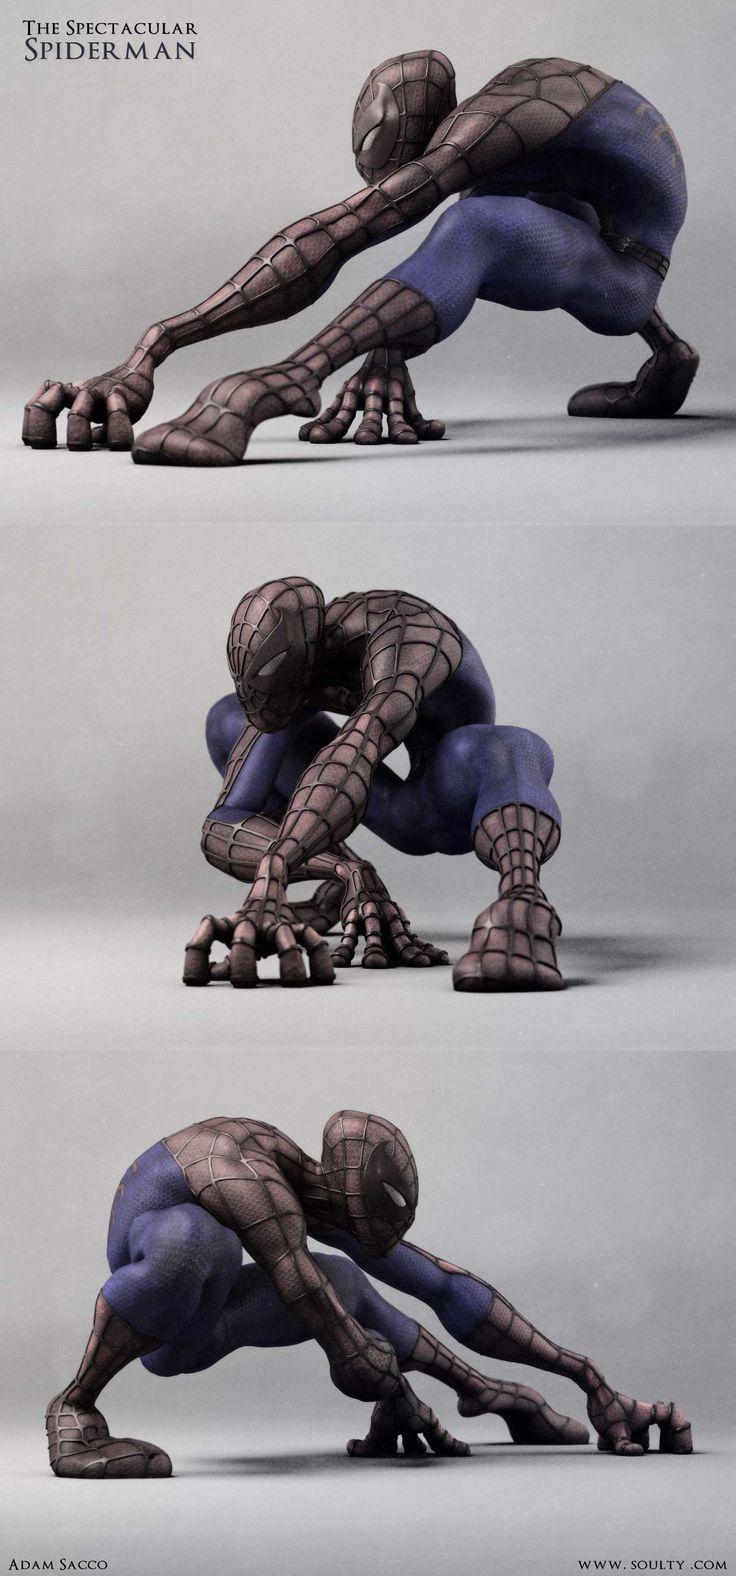 Yury Muzyrya: 151 Best 3D Cartoon & Stylized Characters Images On